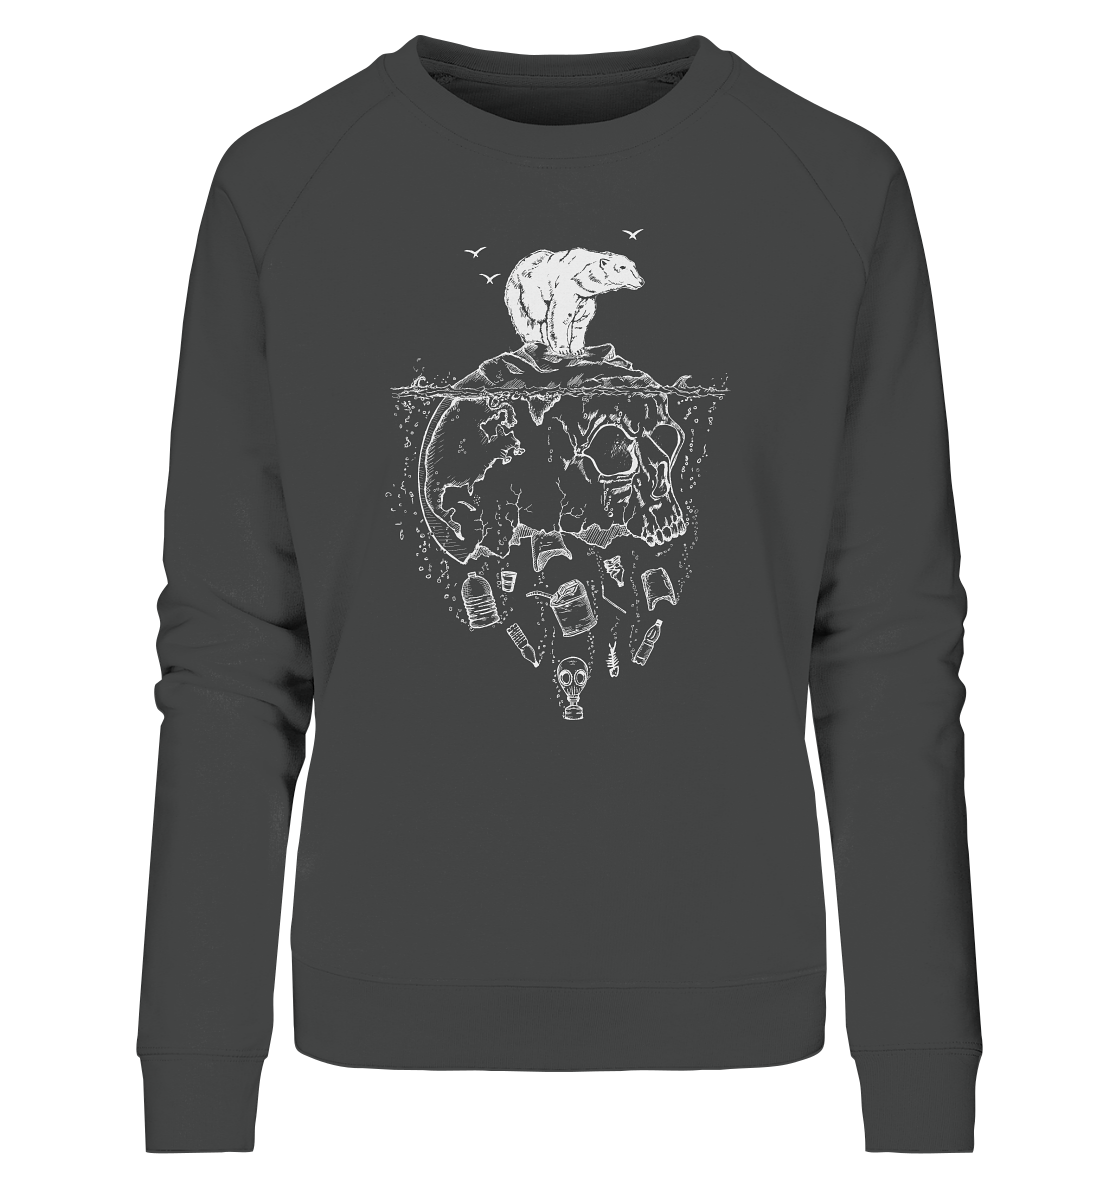 front-ladies-organic-sweatshirt-444545-1116x-5.png